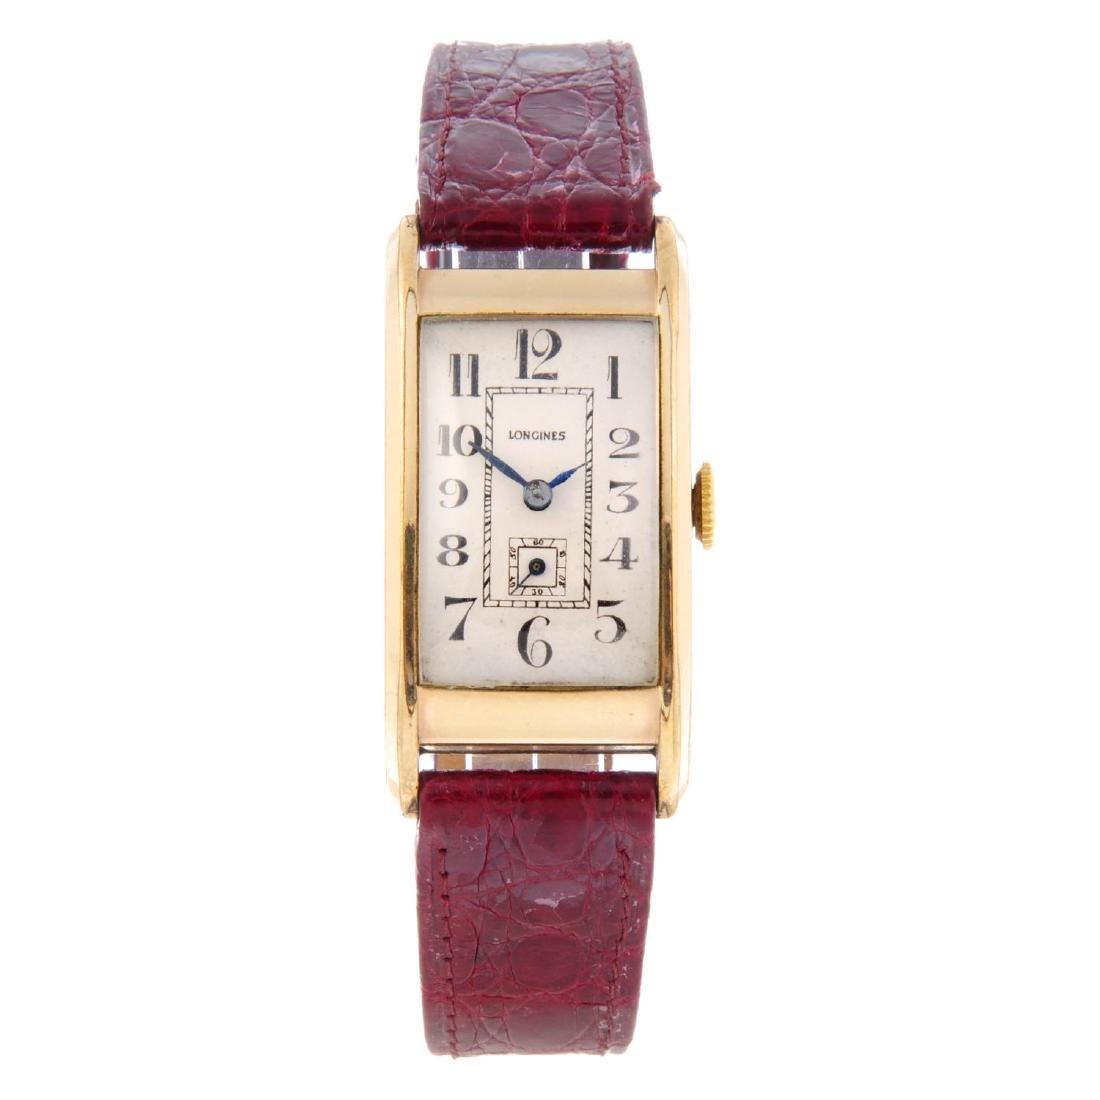 LONGINES - a gentleman's wrist watch. Gold plated case